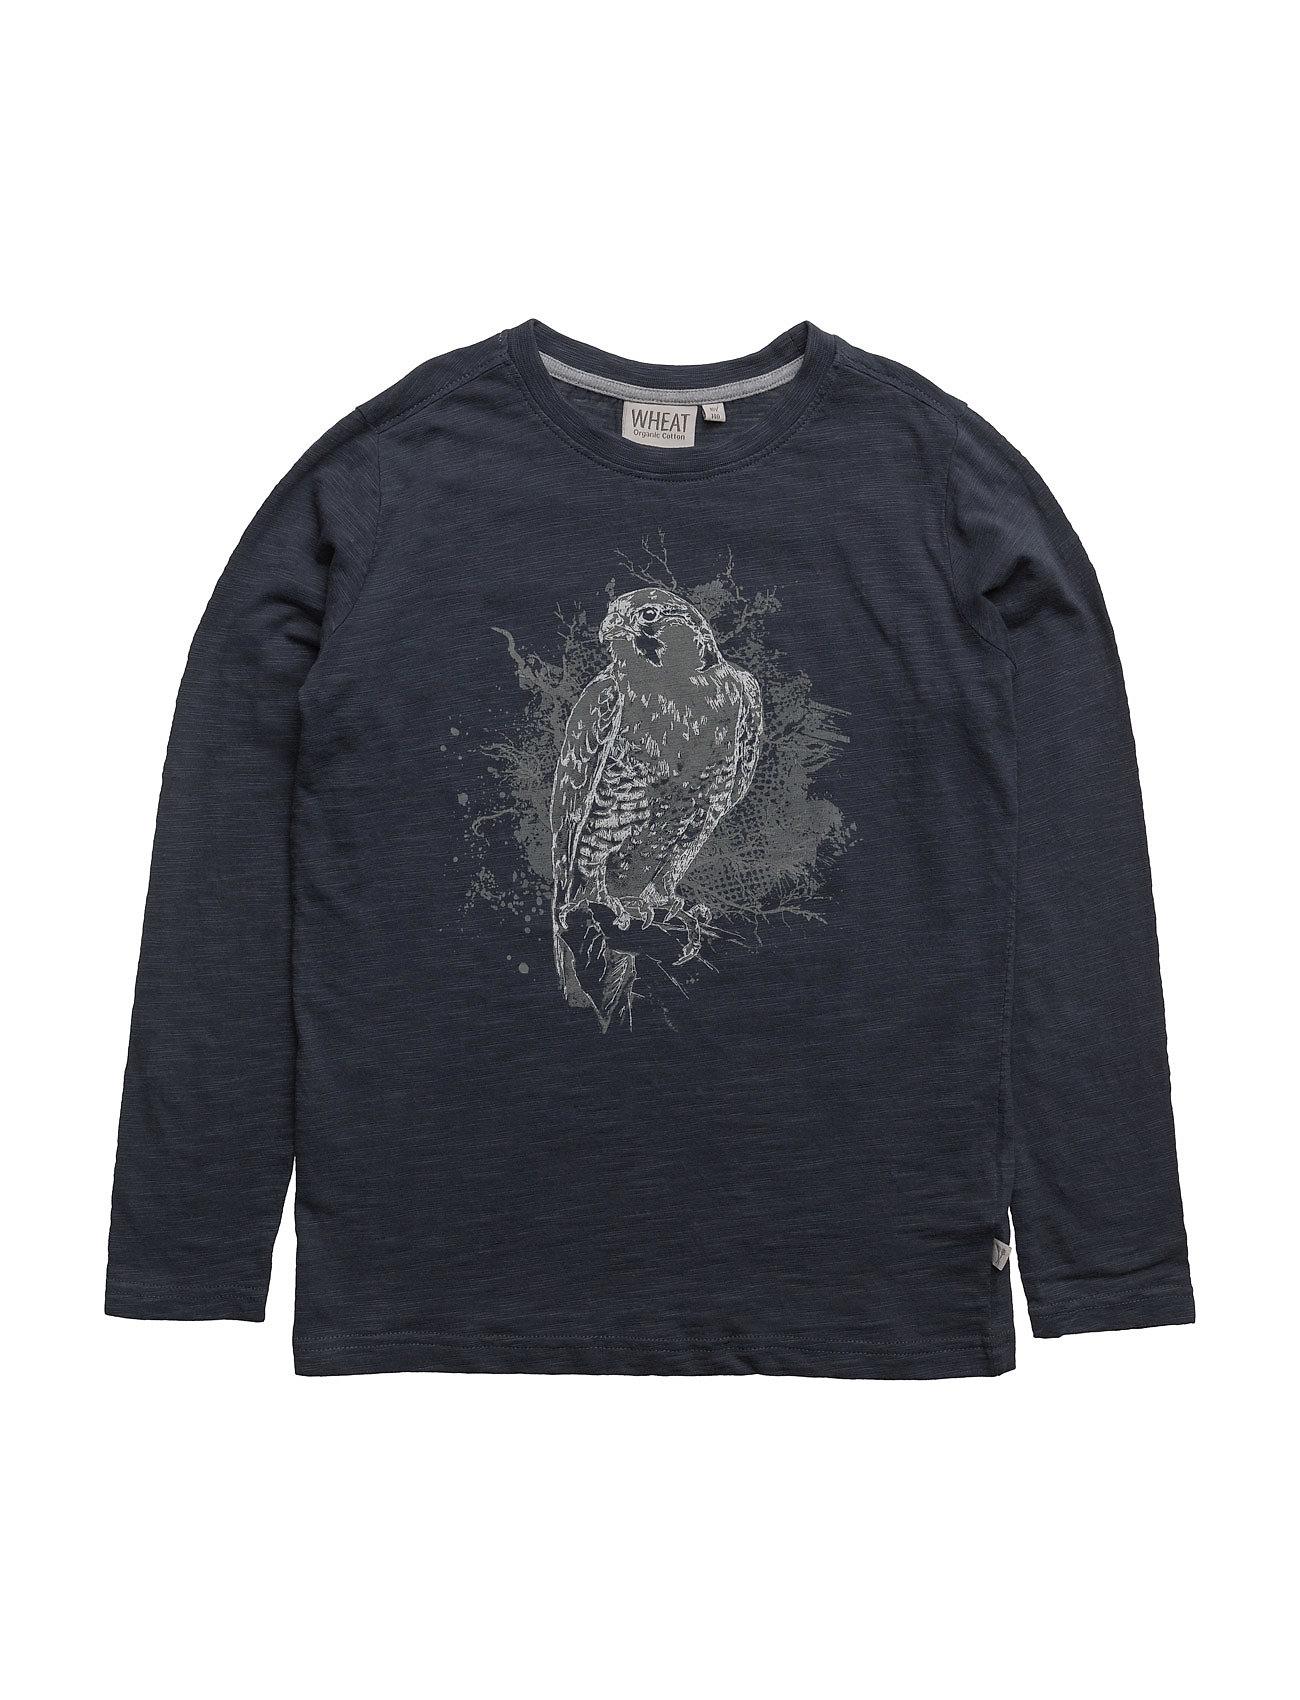 T-shirt eagle ls fra wheat fra boozt.com dk